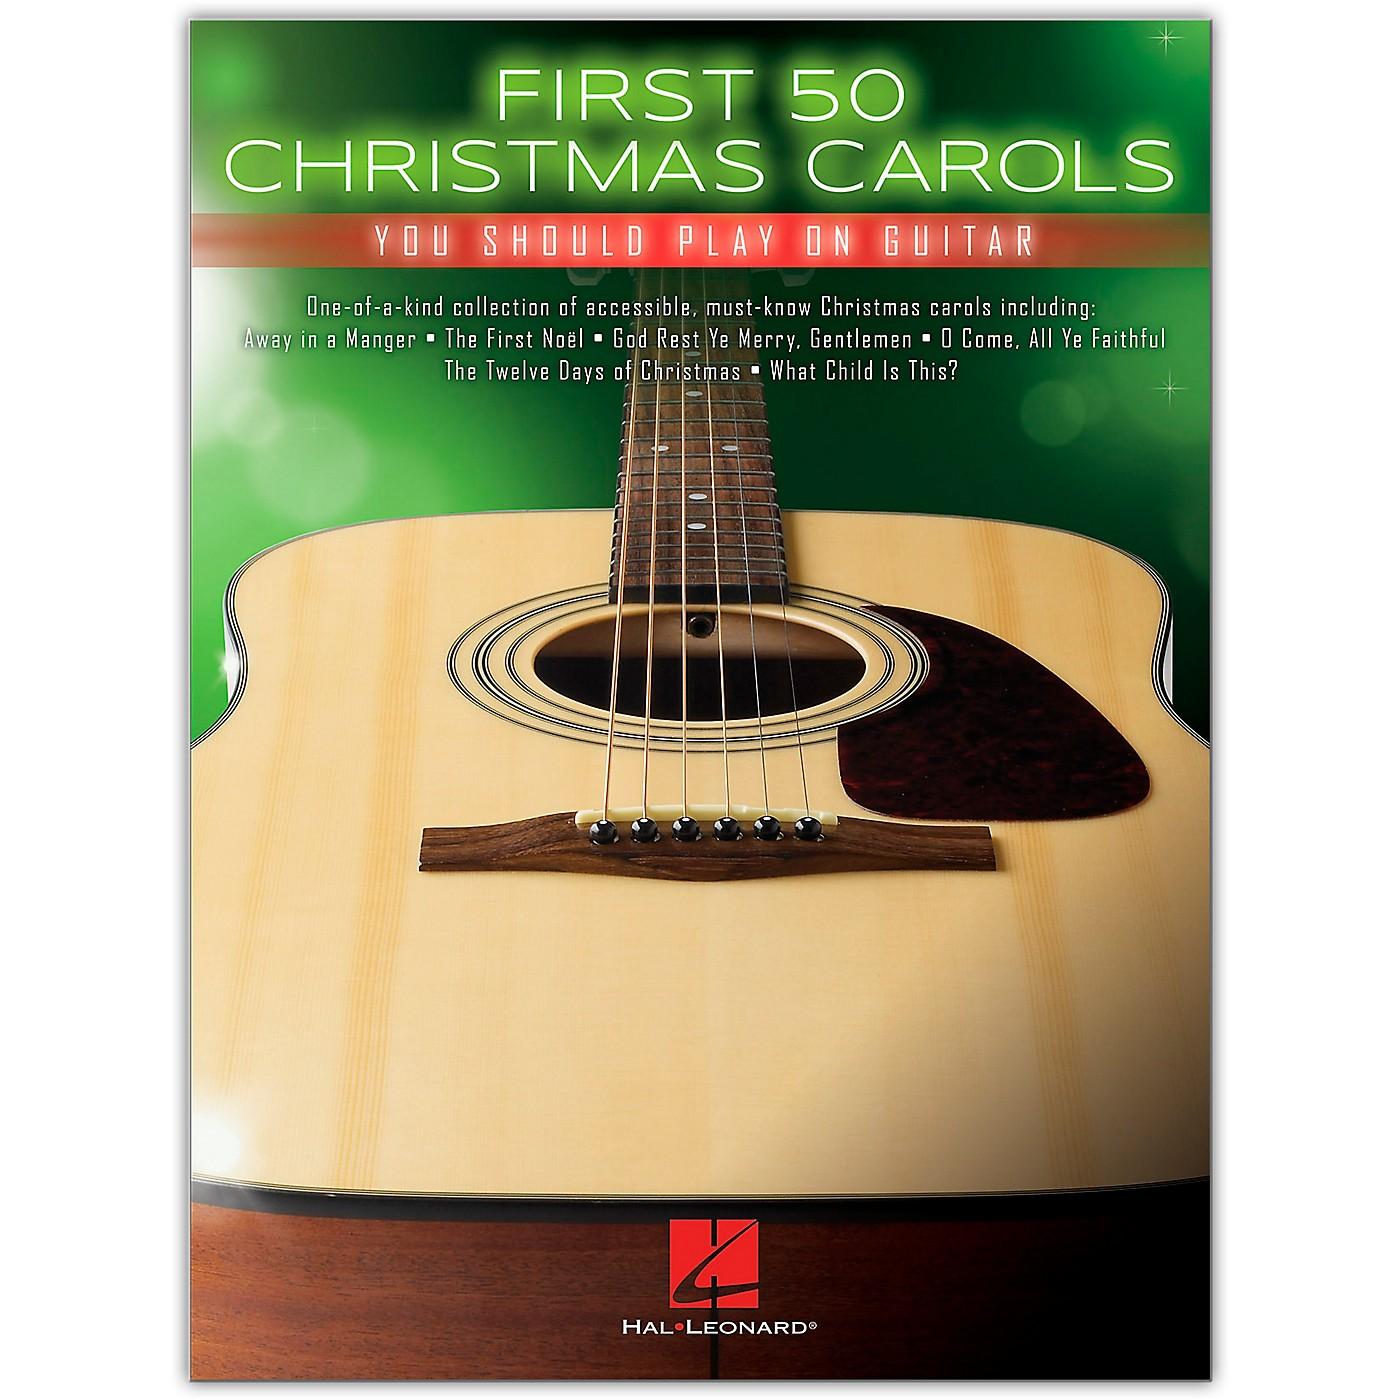 Hal Leonard First 50 Christmas Carols You Should Play on Guitar thumbnail